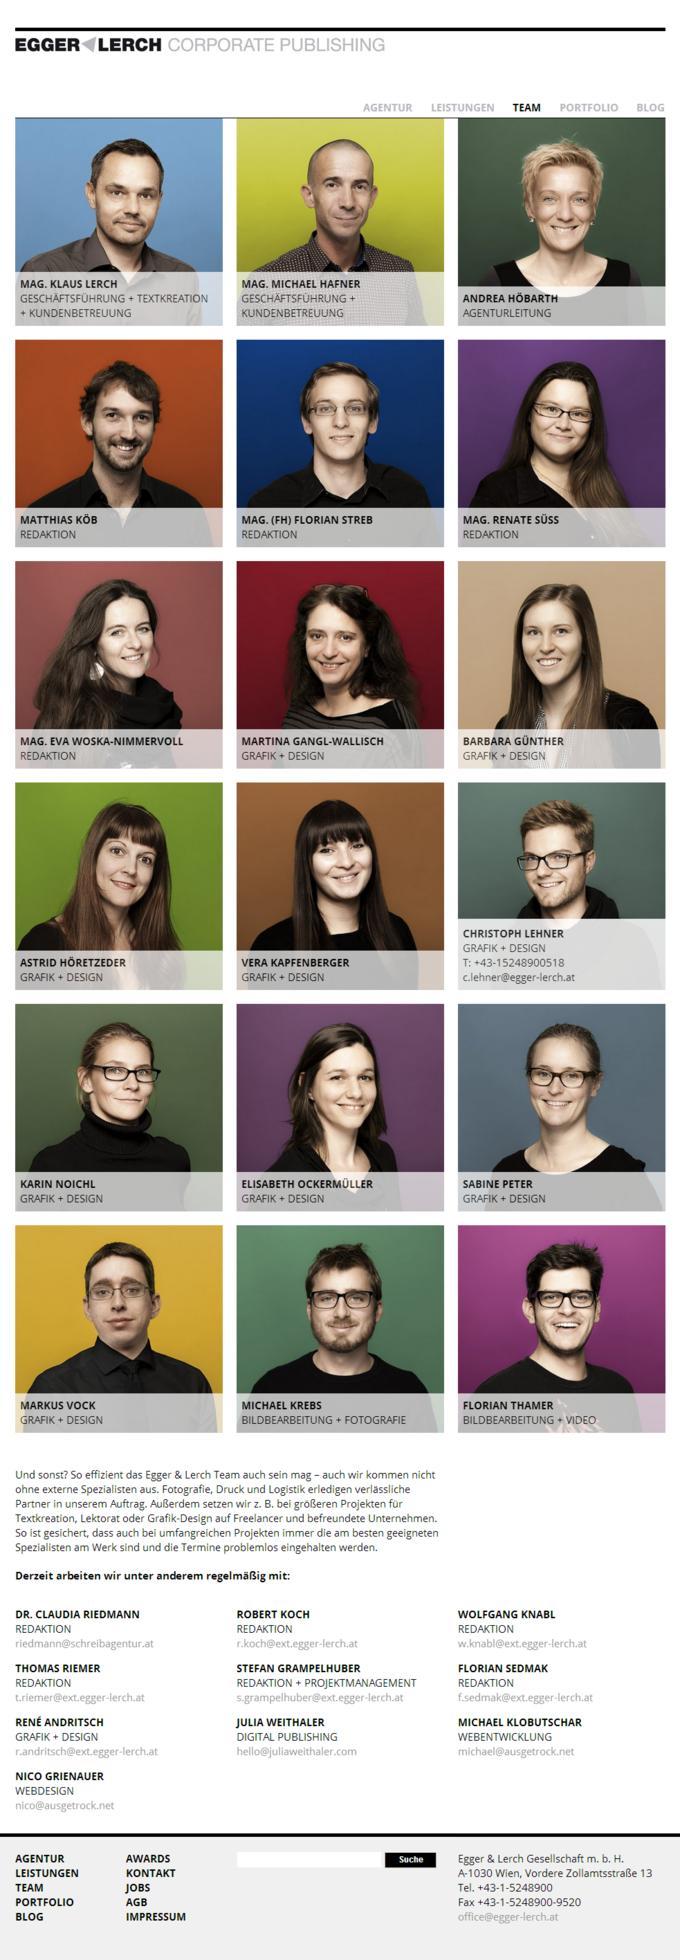 Egger & Lerch - Corporate Publishing - Team Screenshot